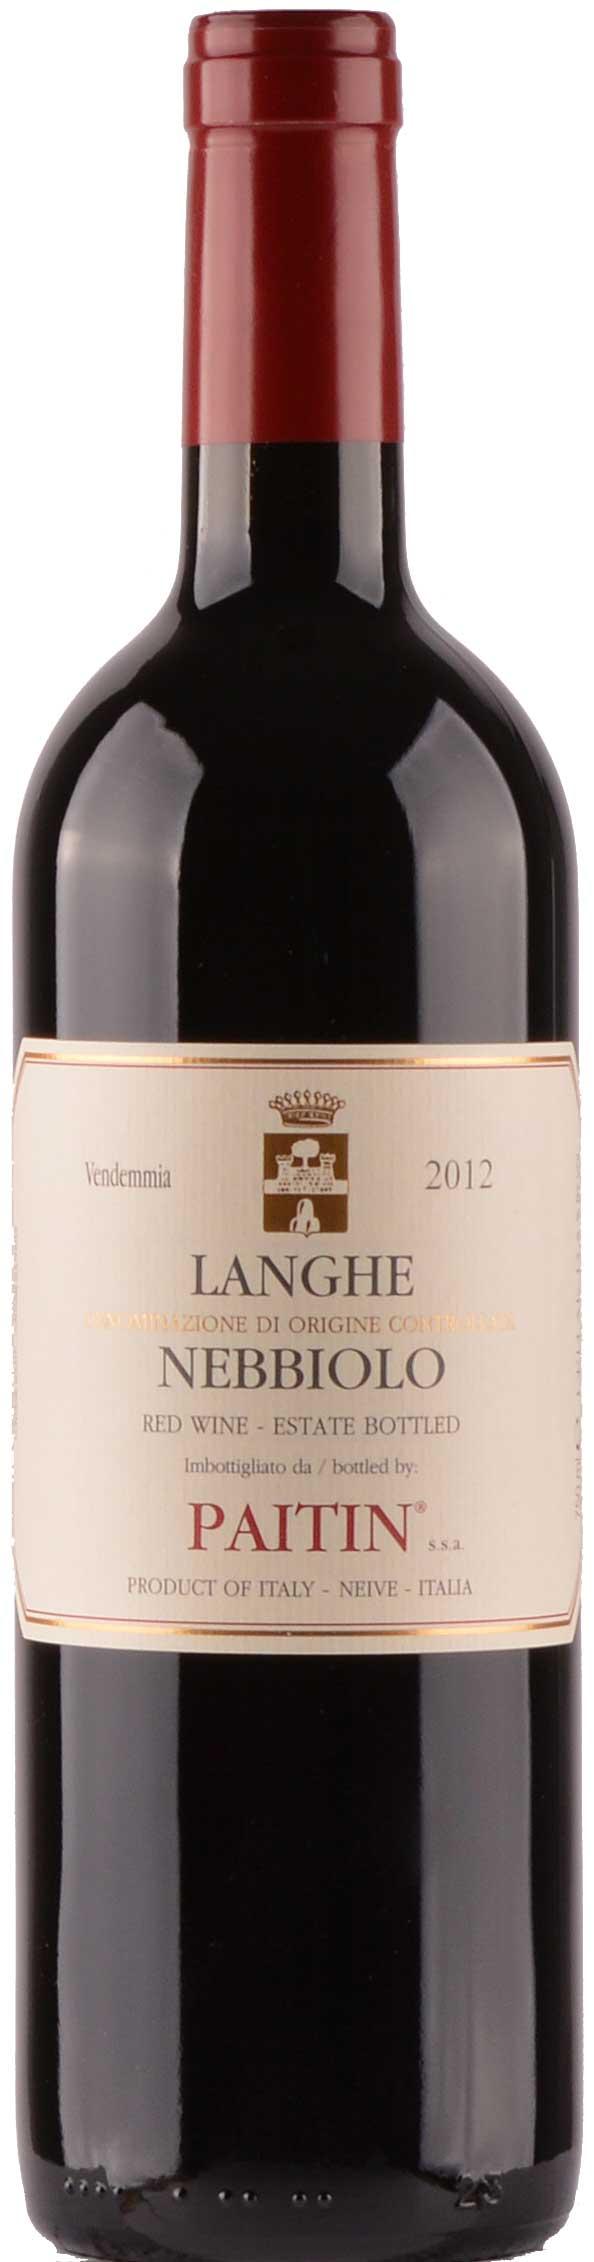 Langhe Nebbiolo ( Paitin ) 2012